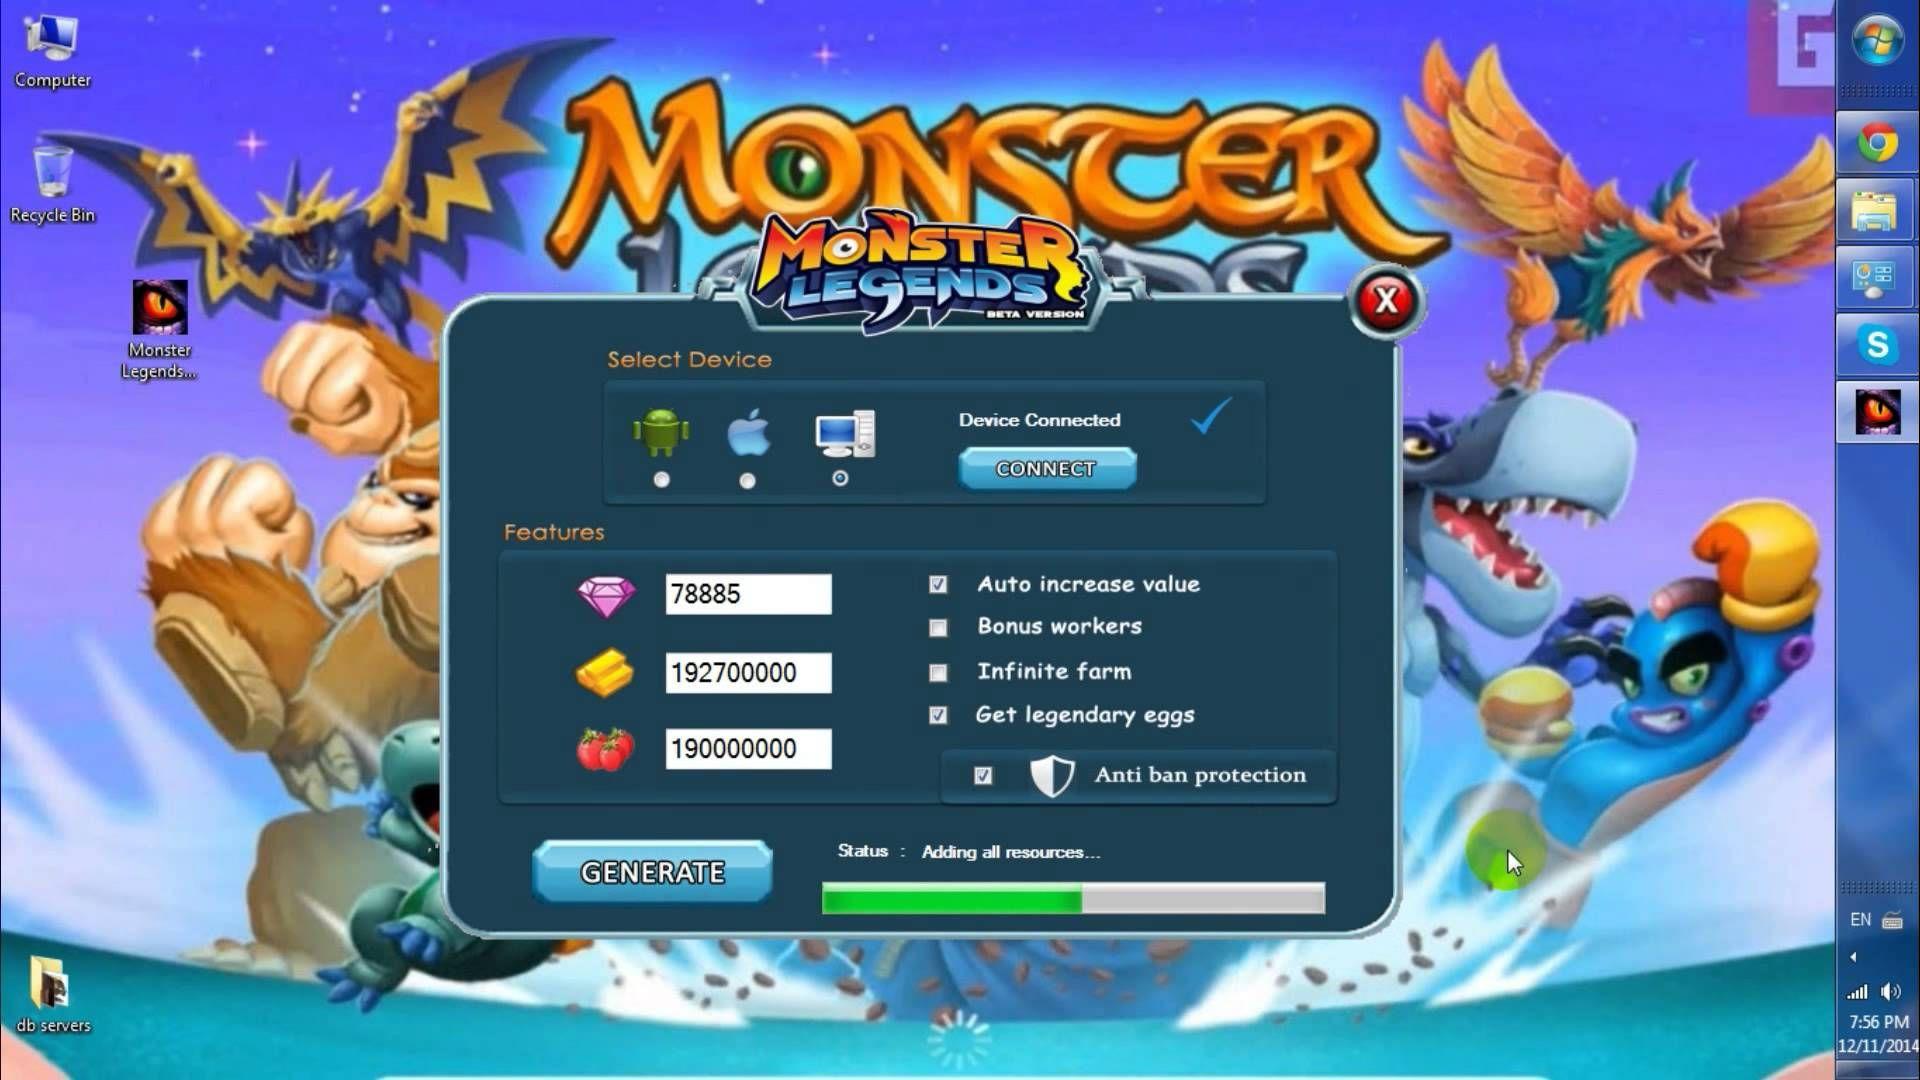 [No Survey] Monster Legends Hack 2018 Updated Generator